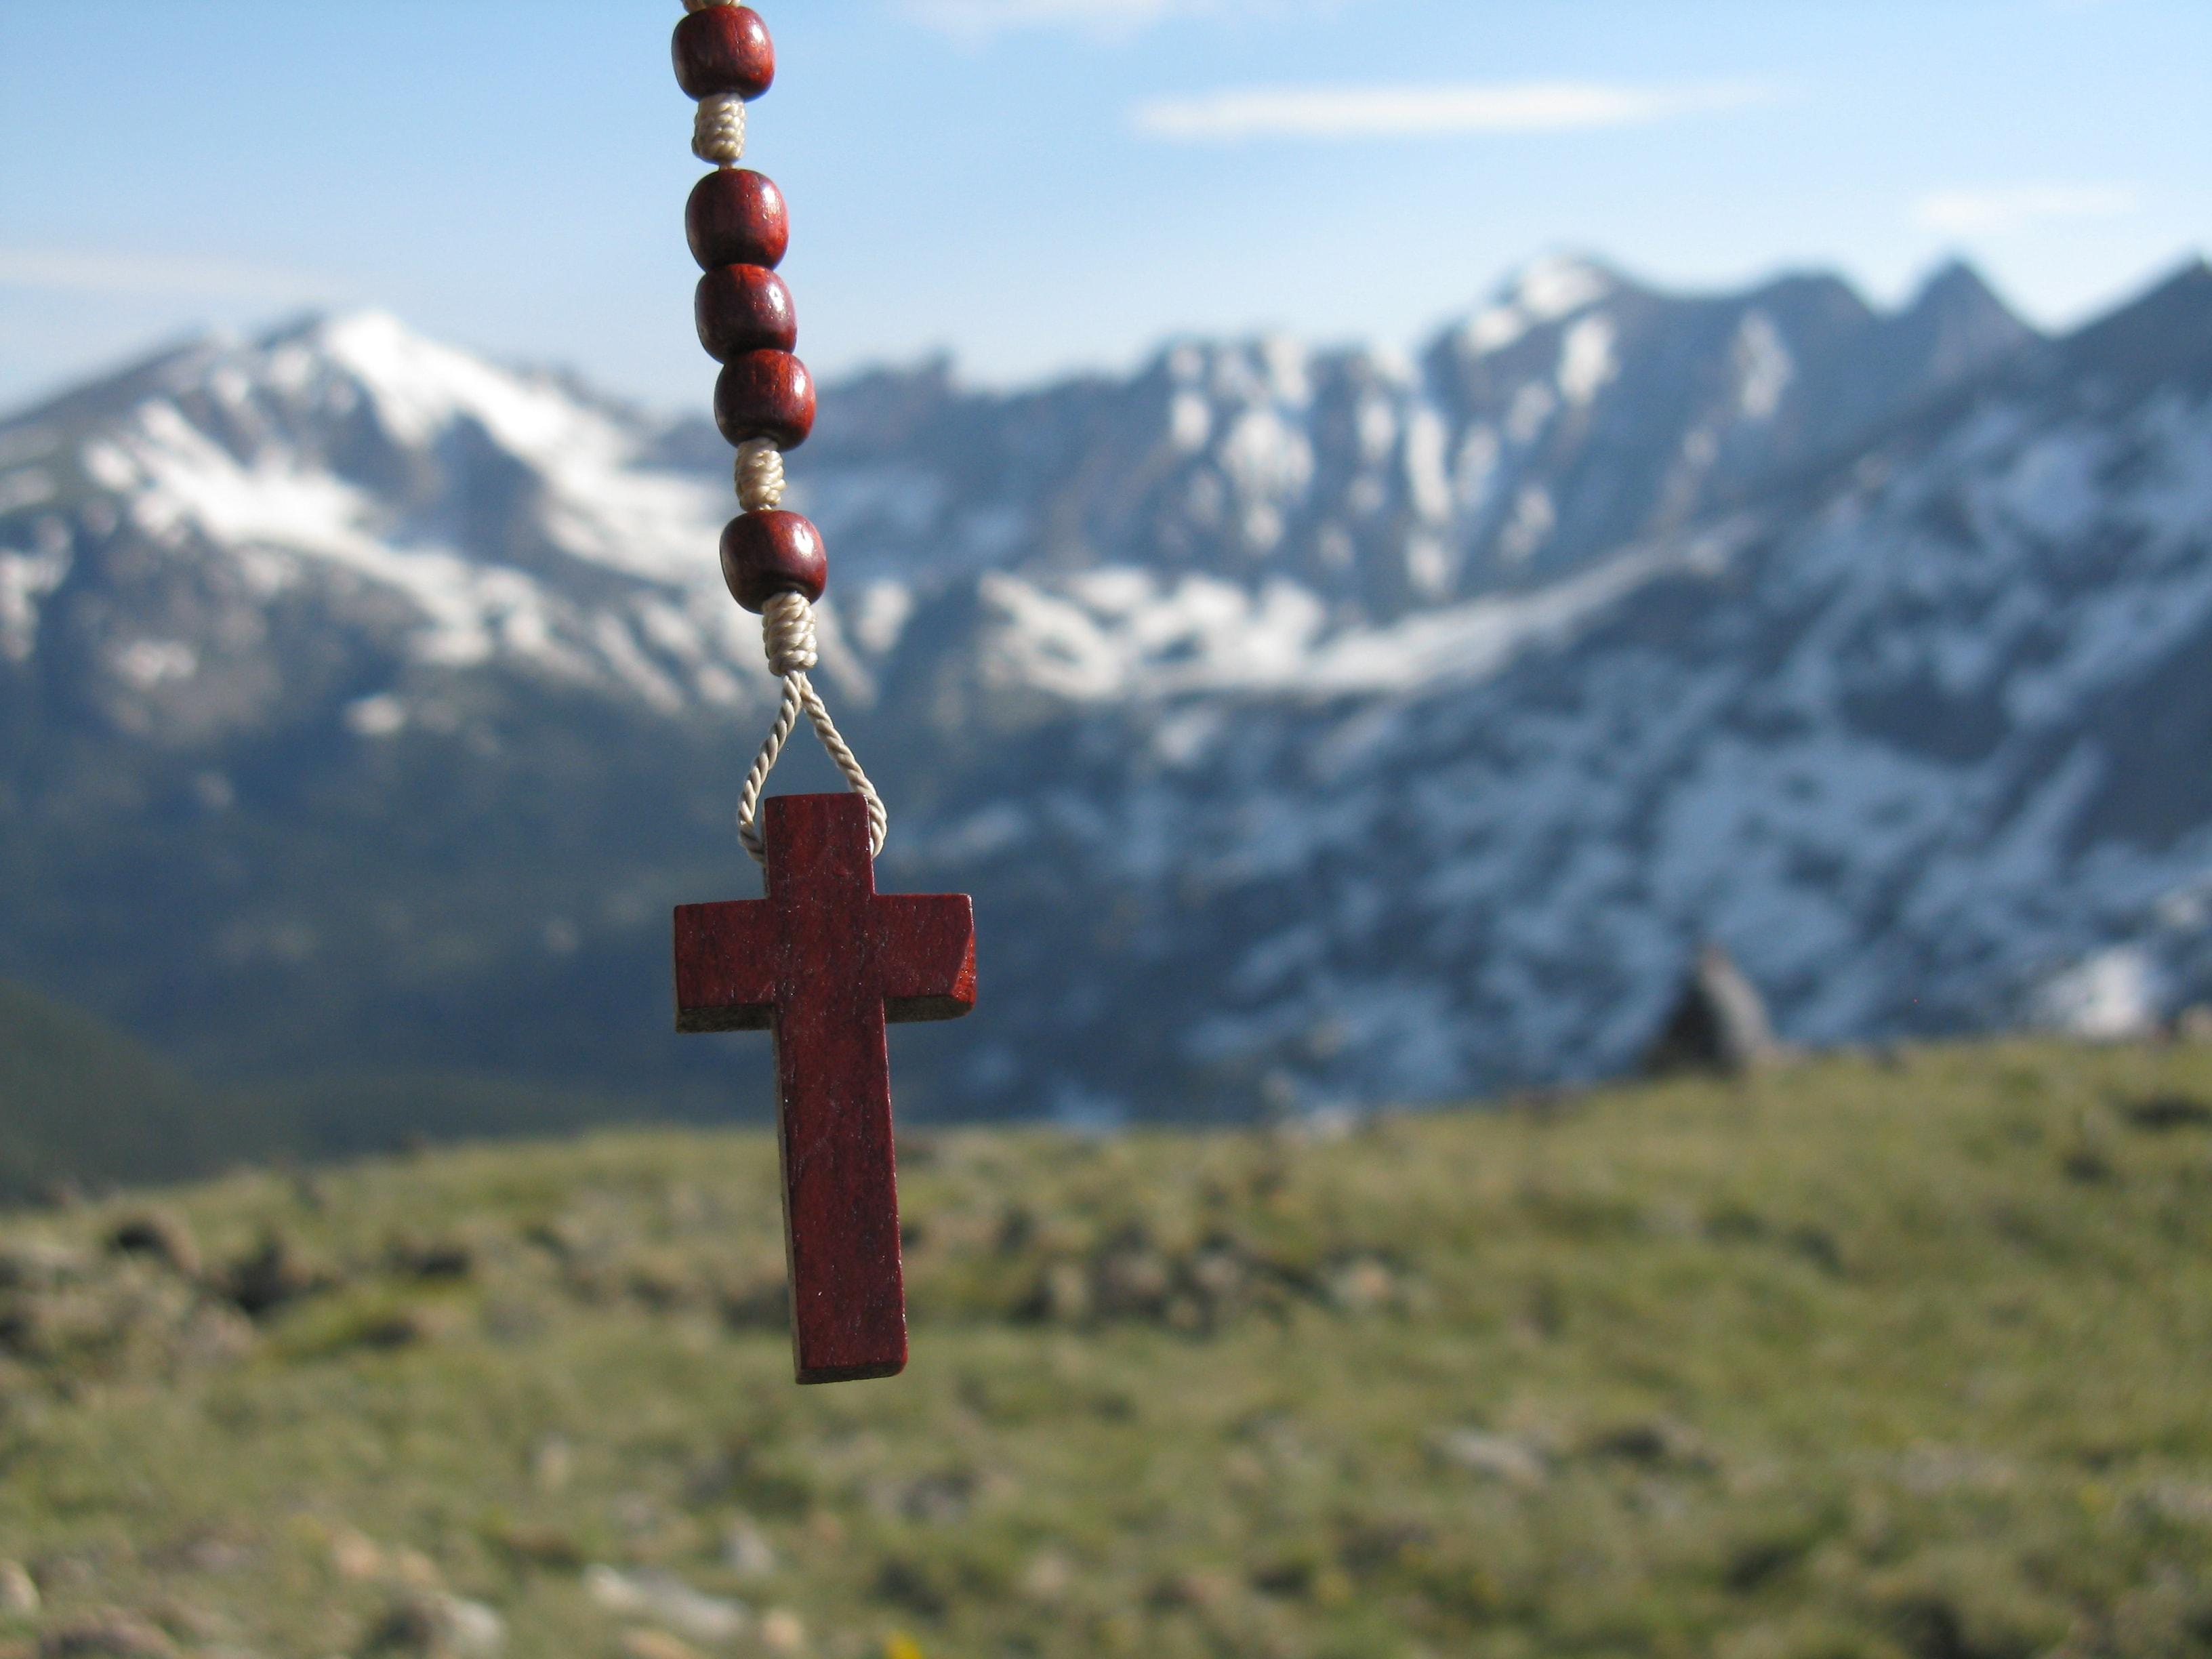 Image by Jesse Weiler, CreationSwap.com.